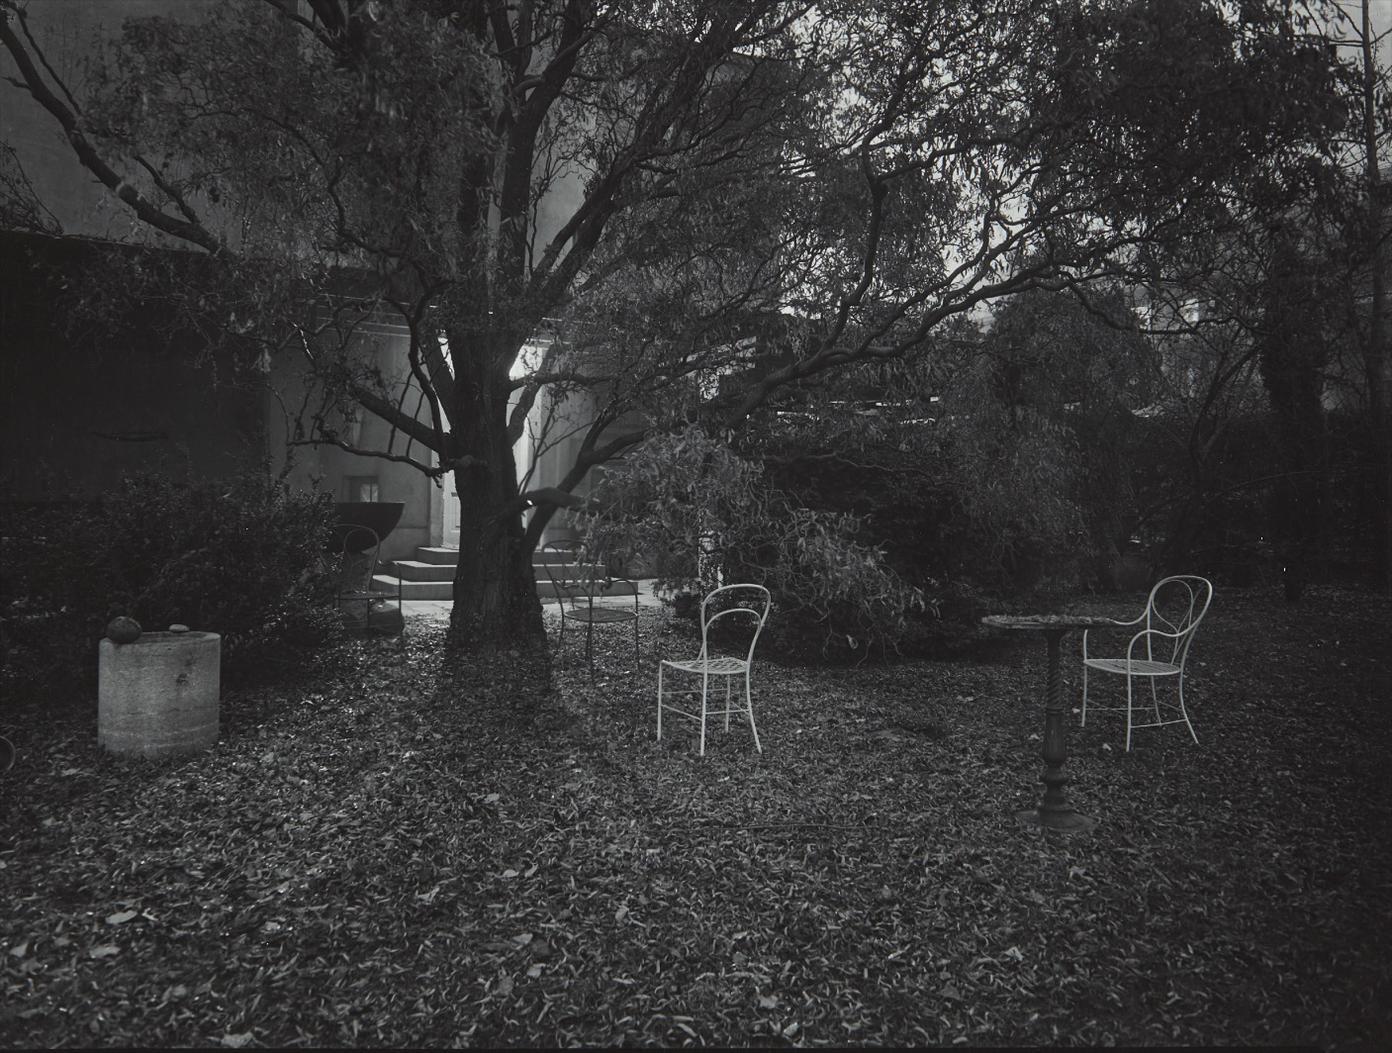 Josef Sudek-A Walk In The Magic Garden-1955